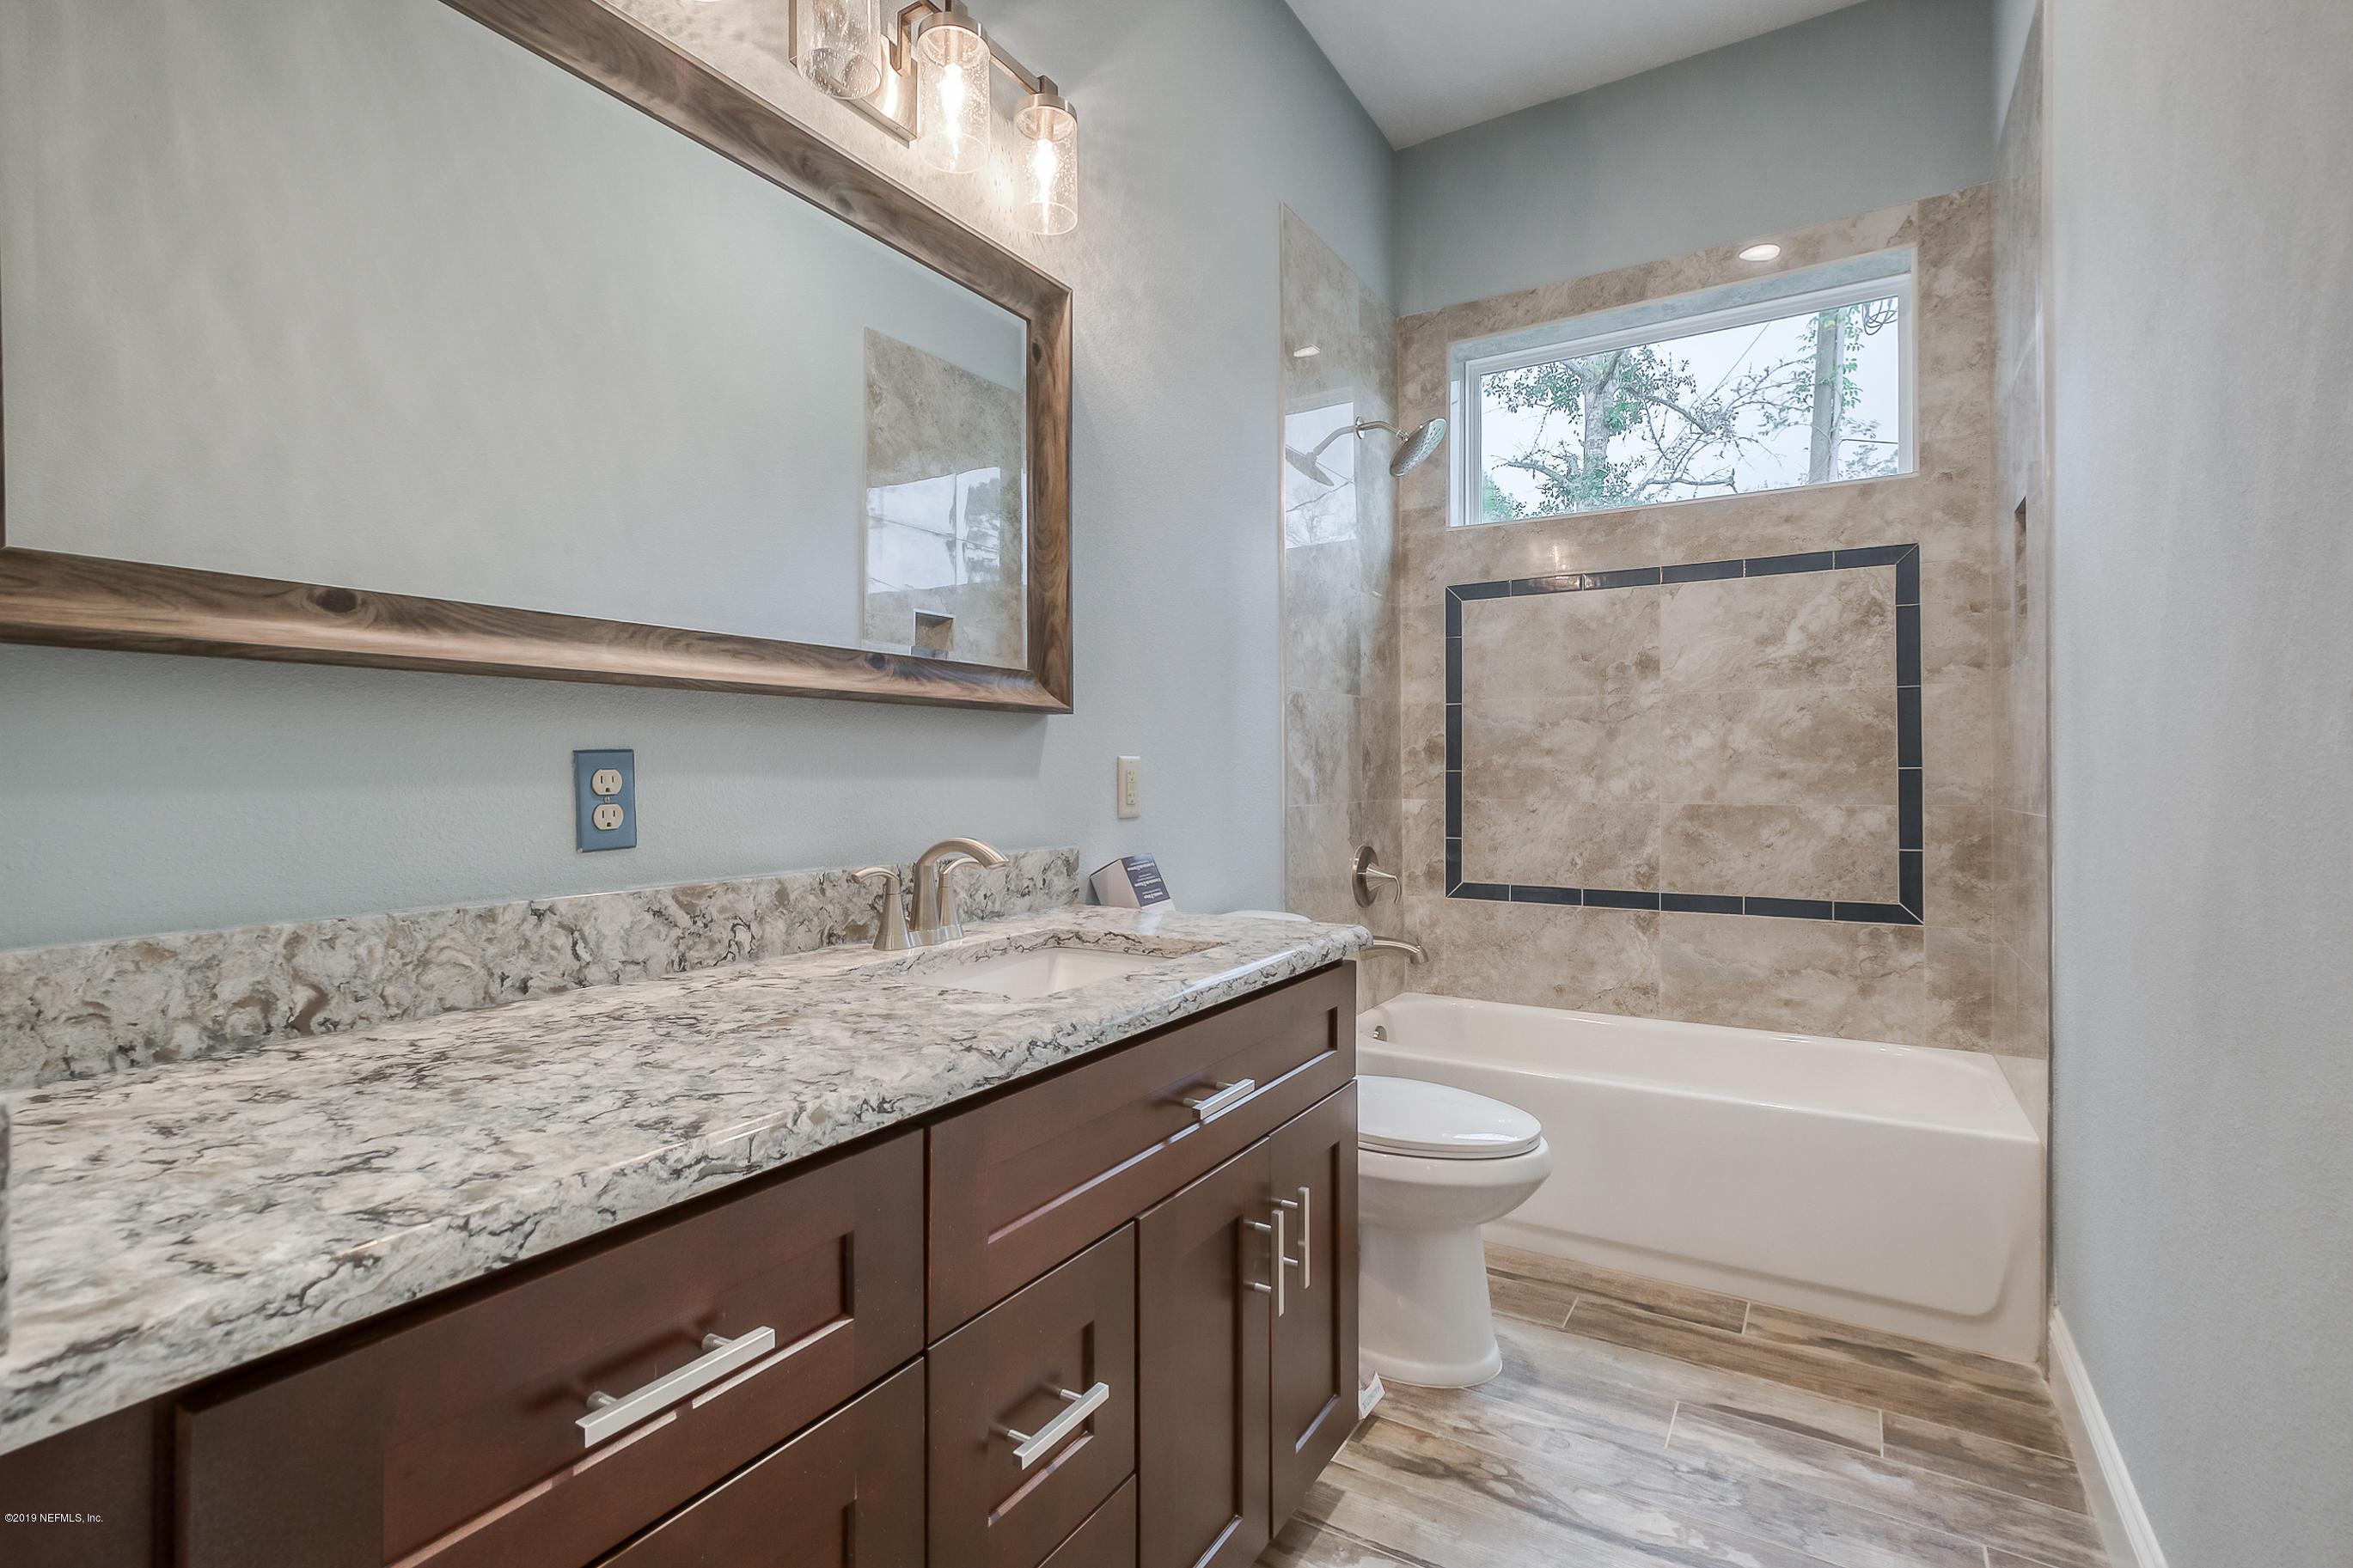 1747-1 LANDWARD, MIDDLEBURG, FLORIDA 32068, 4 Bedrooms Bedrooms, ,3 BathroomsBathrooms,Residential,For sale,LANDWARD,1079727